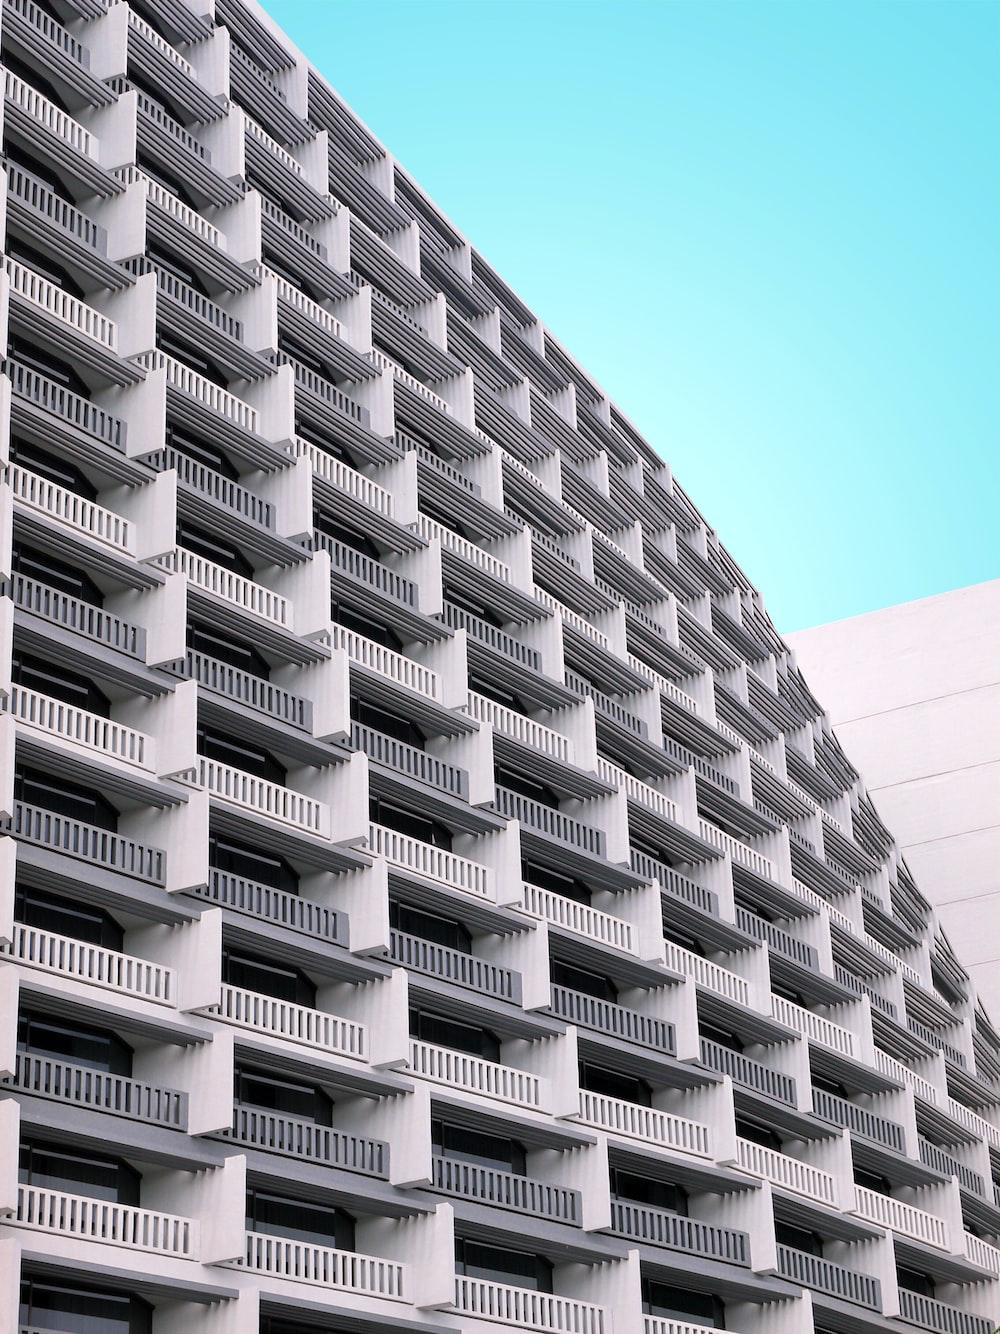 white concrete building with terraces